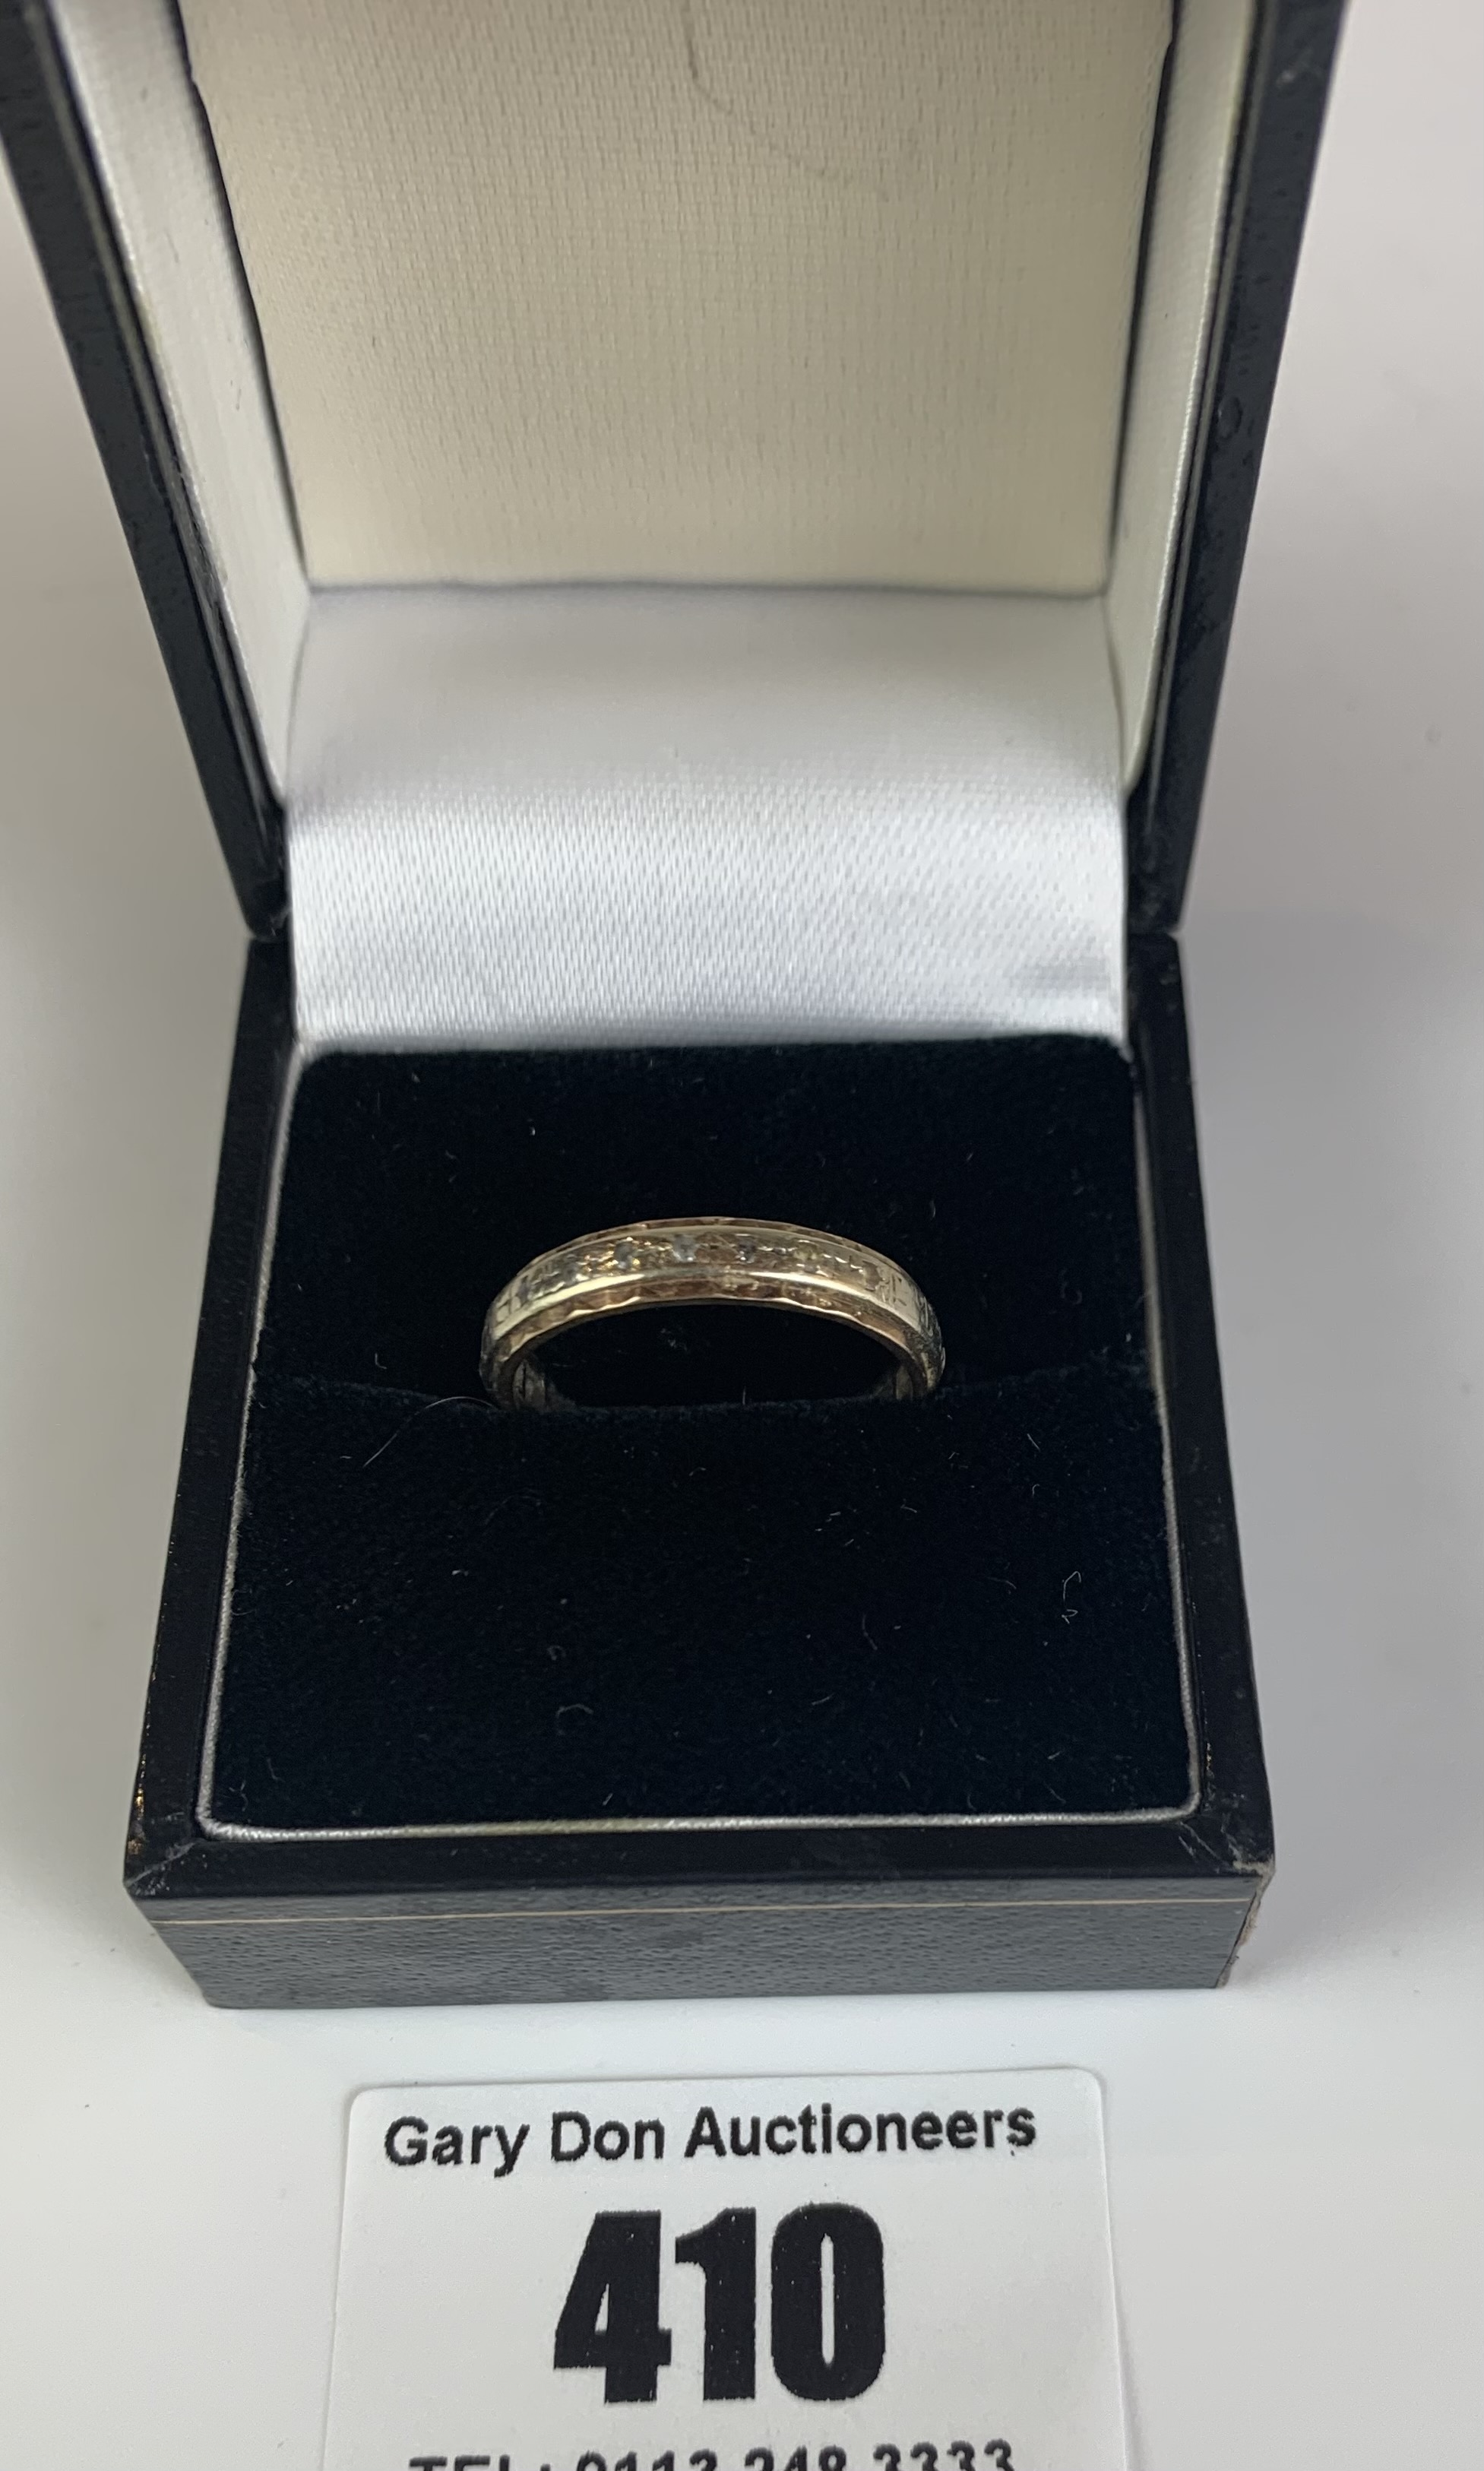 9k gold engraved ring, size N, w: 2.3 gms - Image 2 of 6